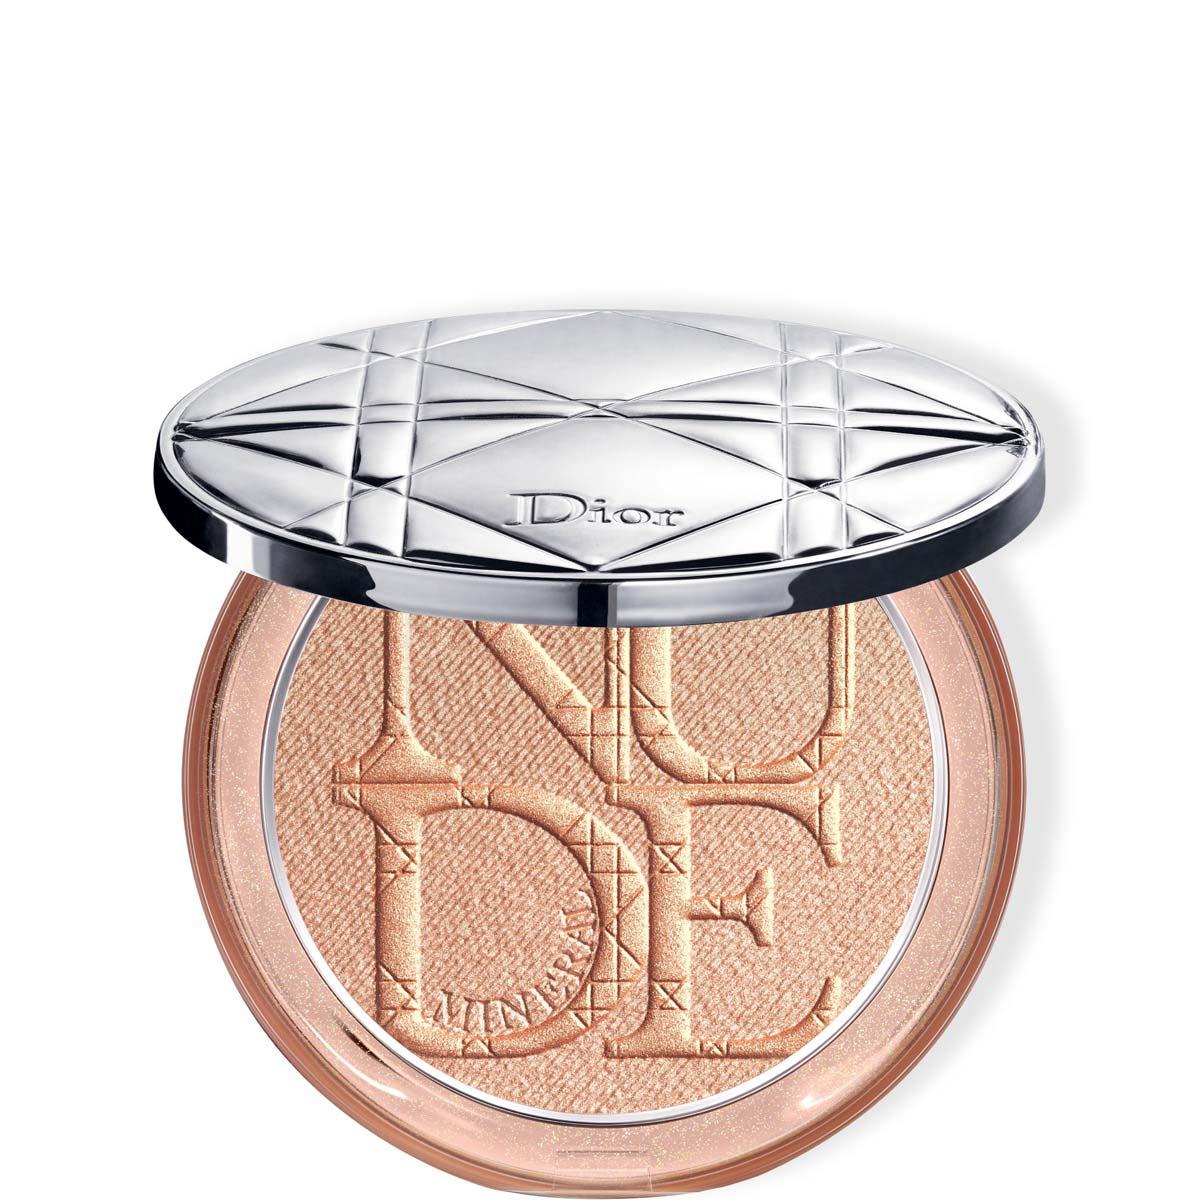 Diorskin Nude Luminizer - DIOR